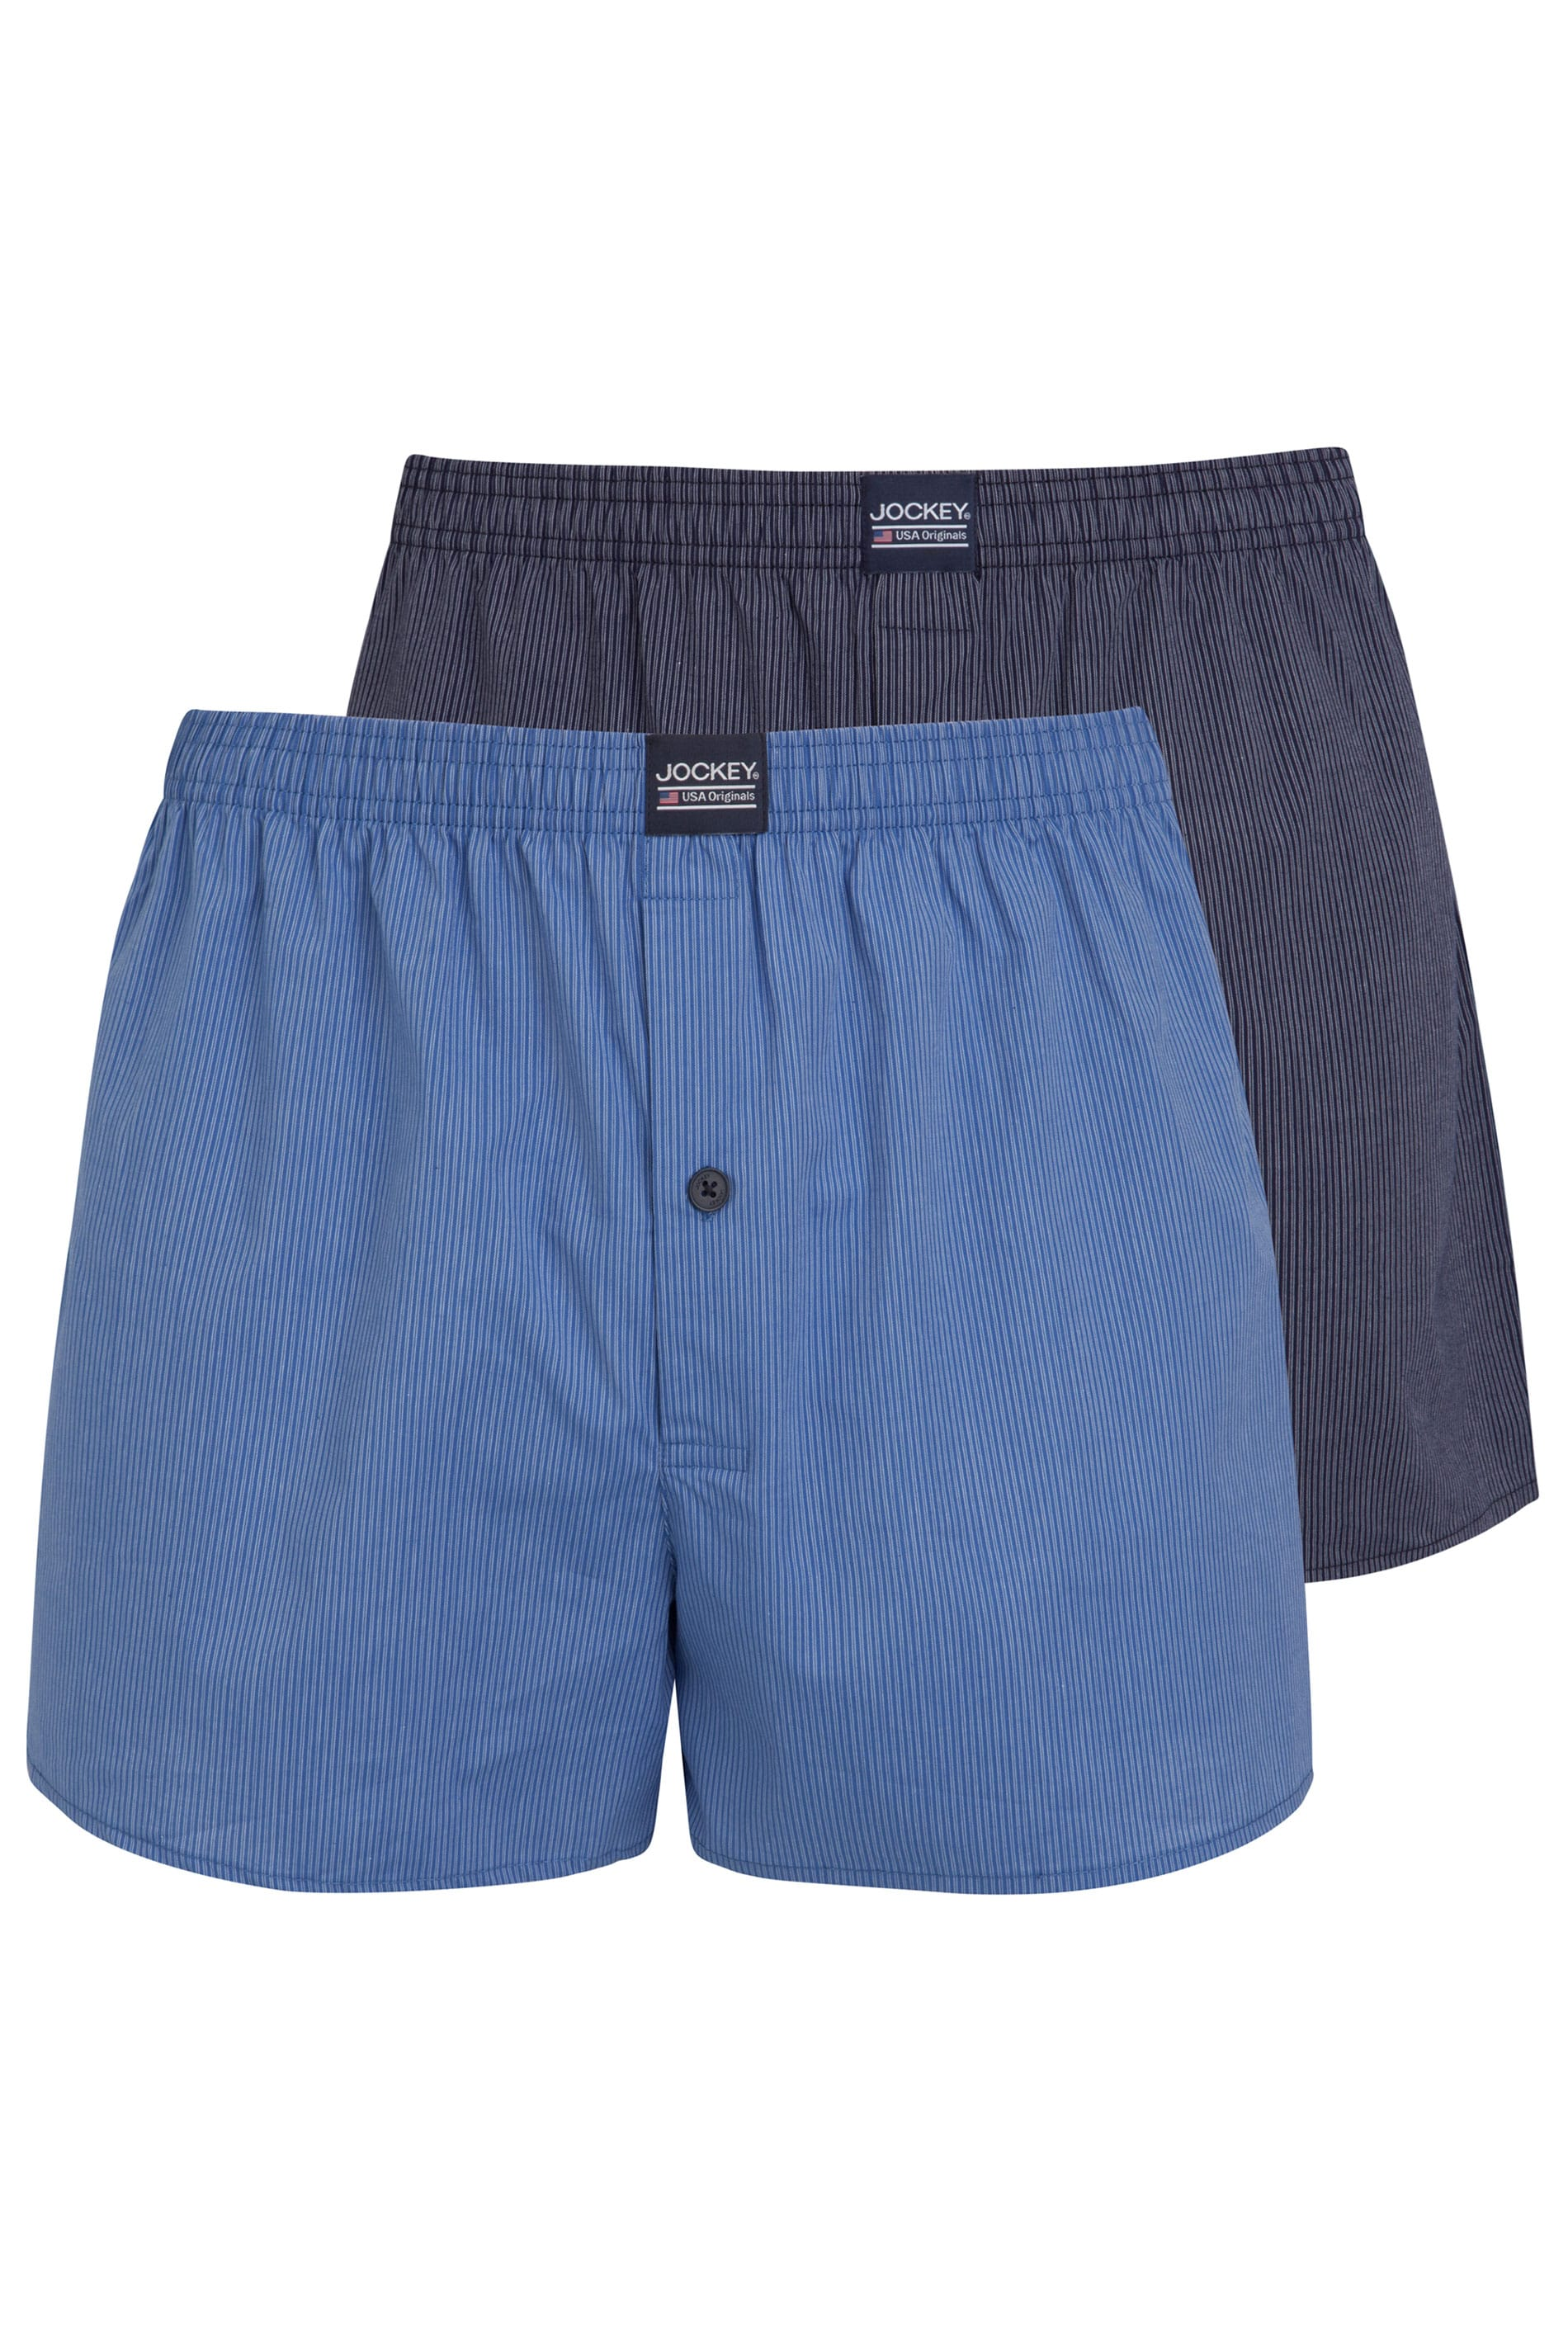 JOCKEY 2 PACK Blue Woven Pinstripe Boxers